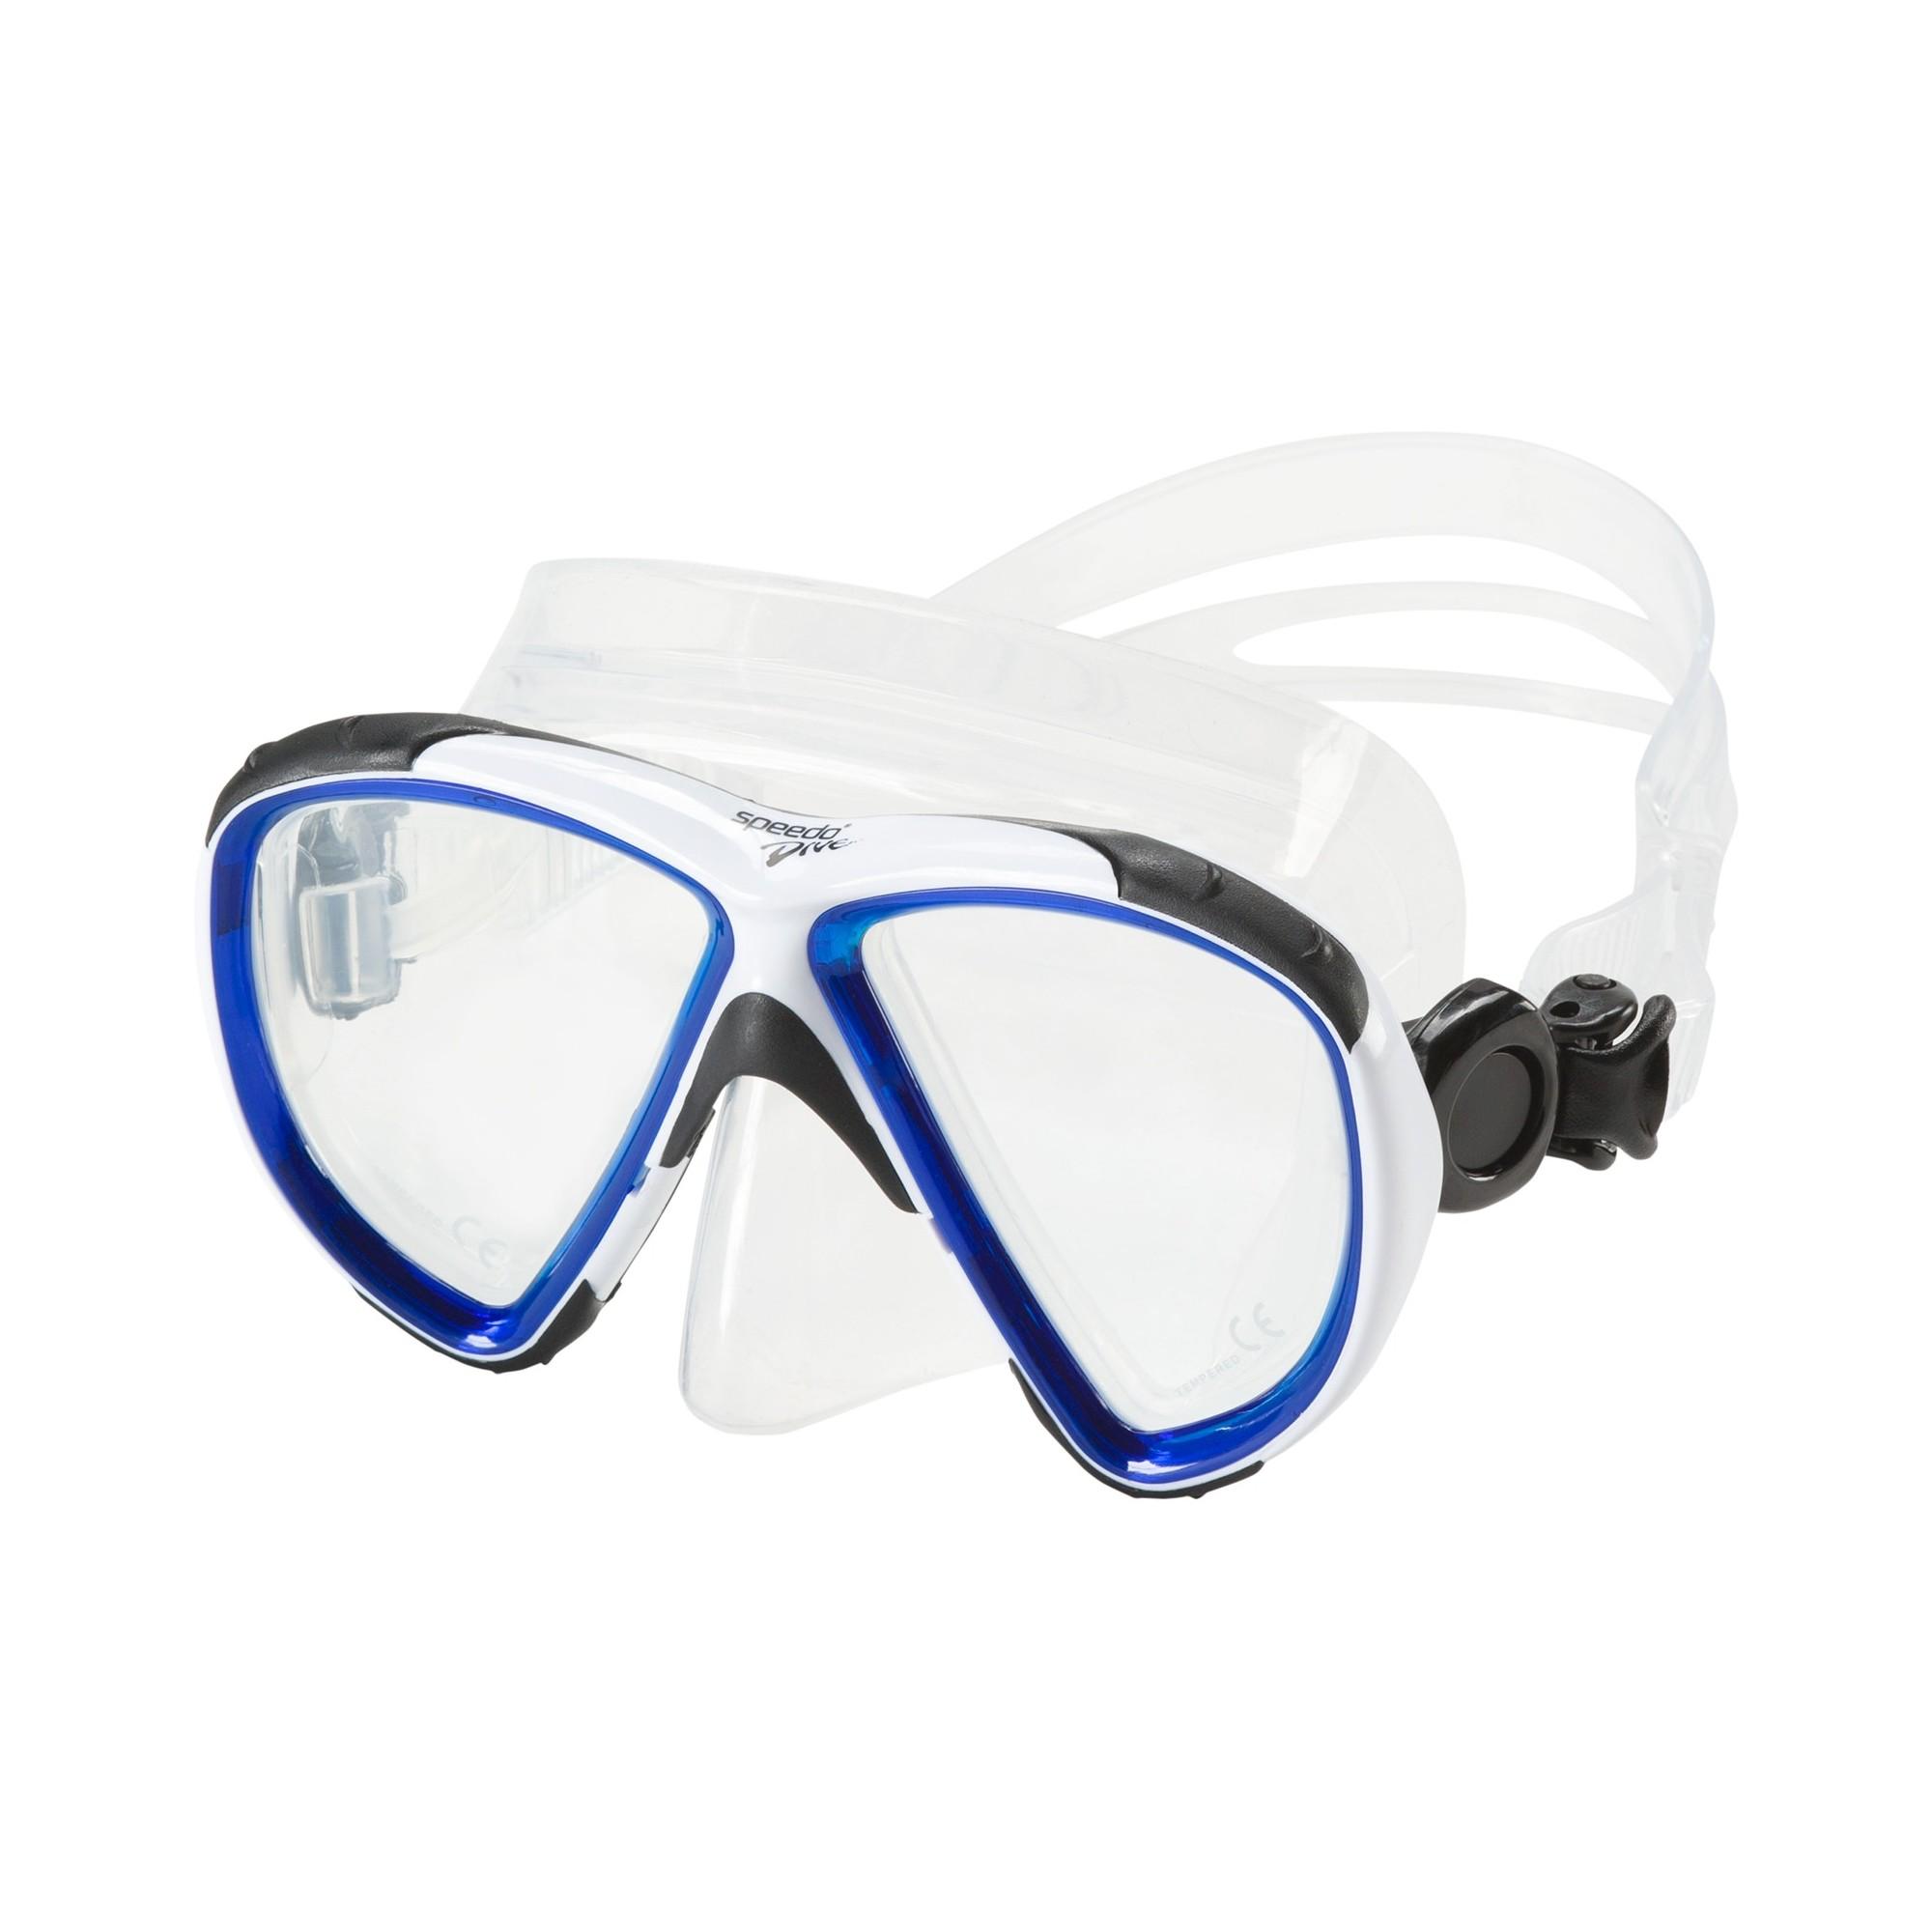 Scuba Titanium Blue Dive Mask NEARSIGHTED Prescription RX Optical Lenses (-4.5) Henry Thayer Thayers  Topical Pain Reliever, 12 oz